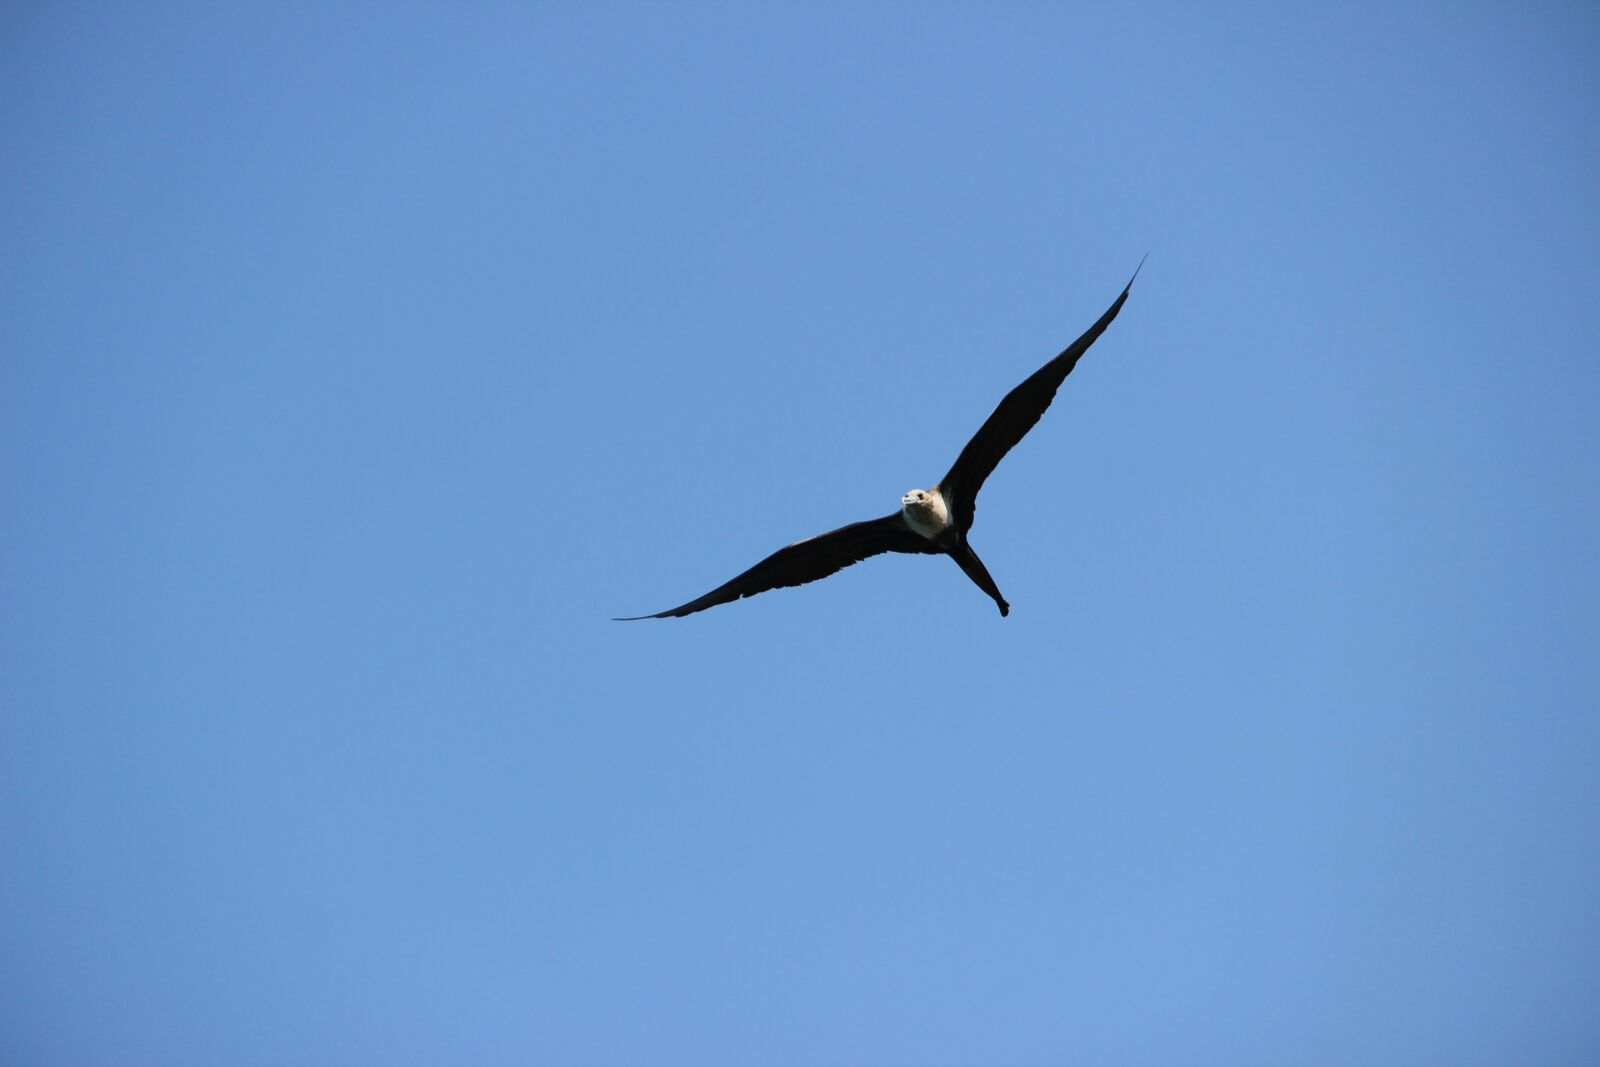 "Canon EOS 600D (Rebel EOS T3i / EOS Kiss X5) sample photo. ""Seagull, flight, bird"" photography"